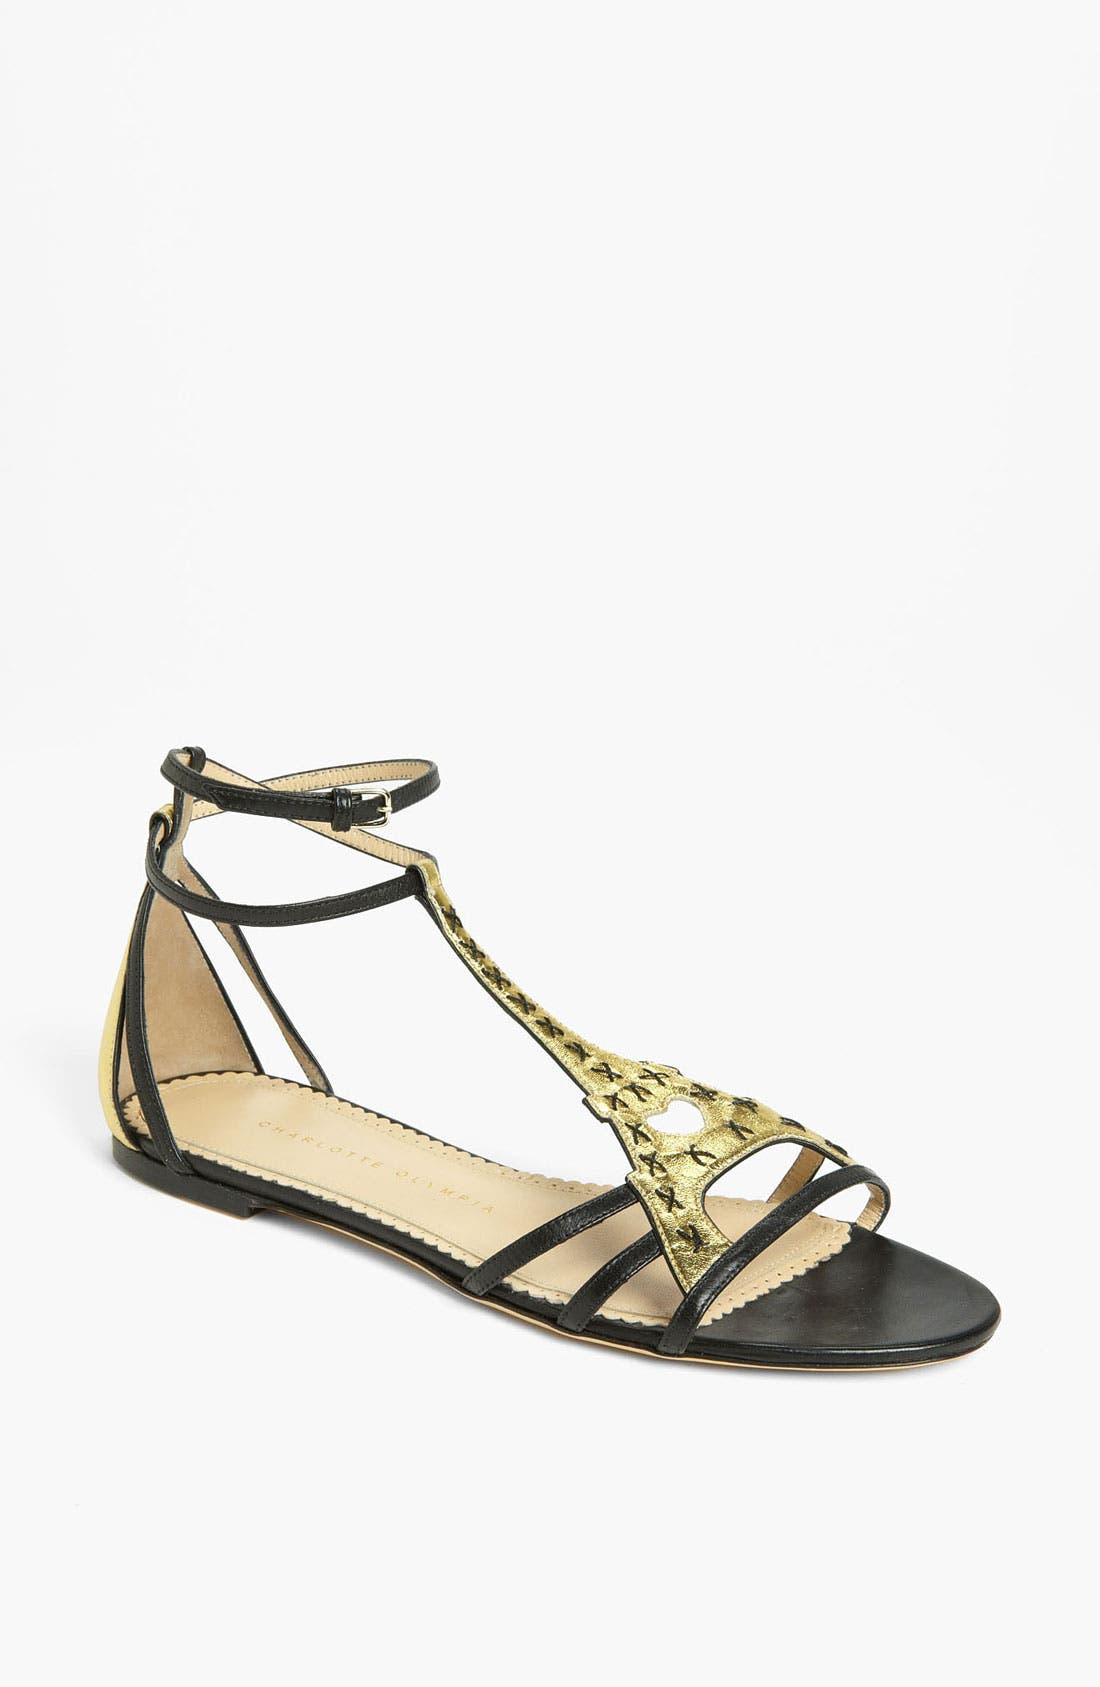 Alternate Image 1 Selected - Charlotte Olympia 'Parisienne' Sandal